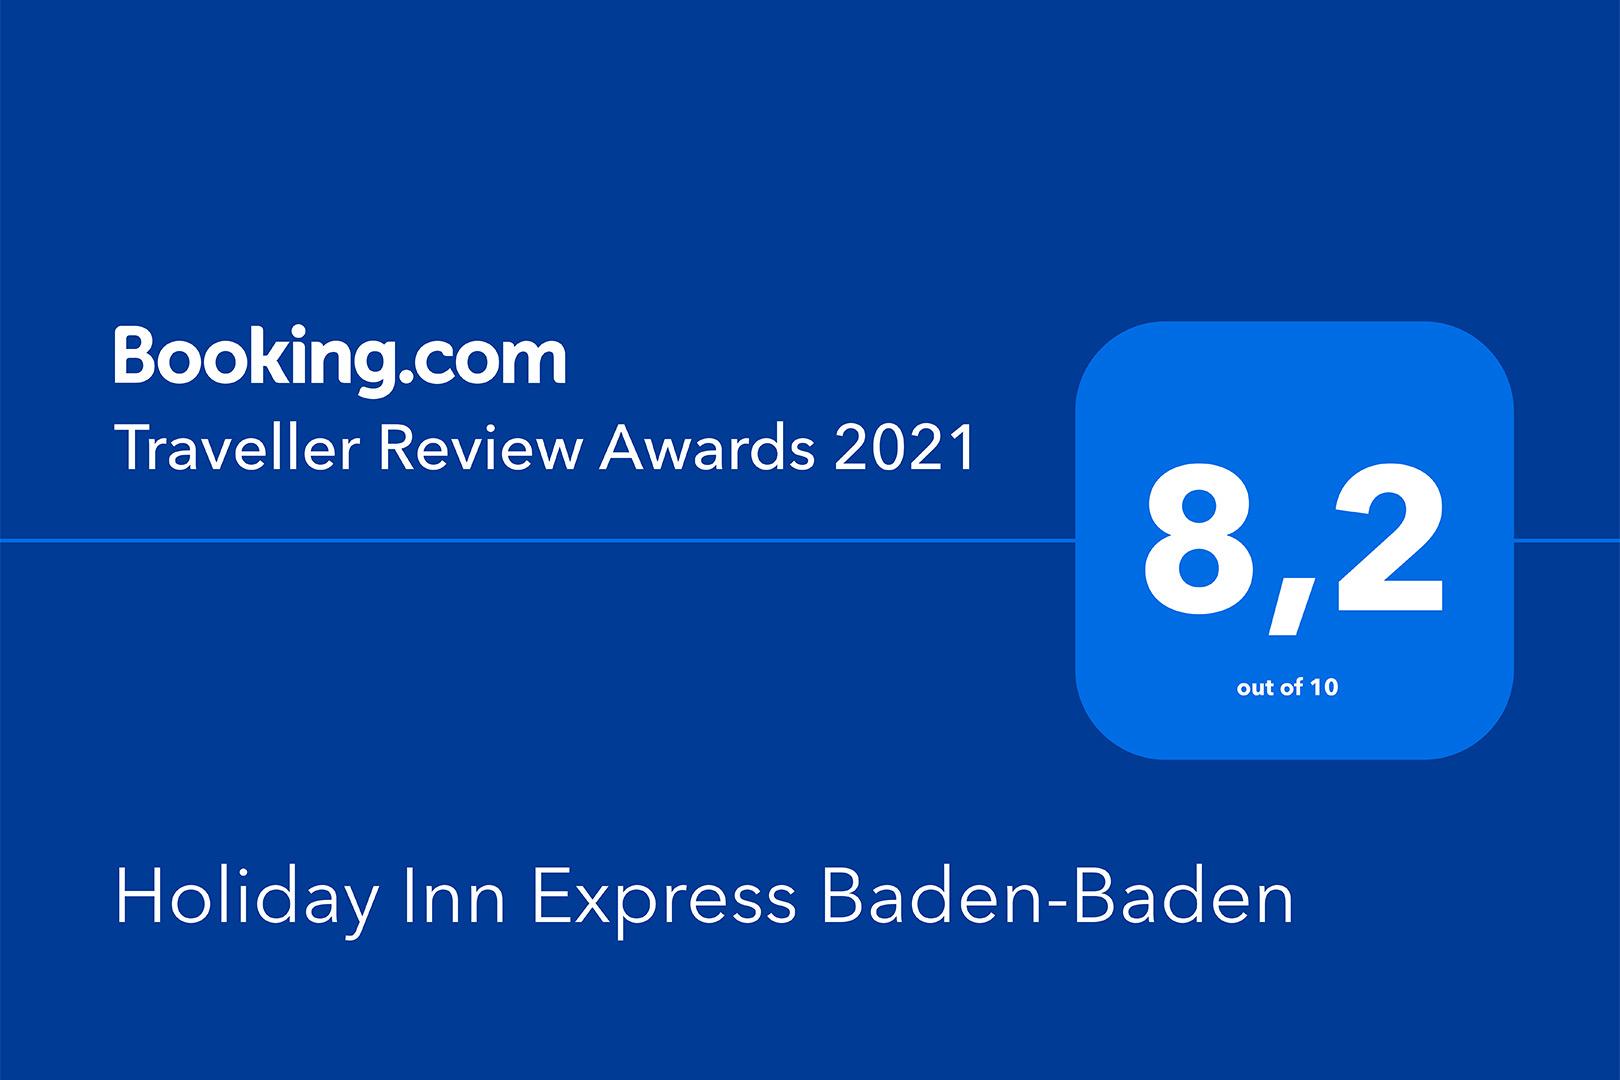 Holiday Inn Express Baden-Baden - Traveller Review Award 2021